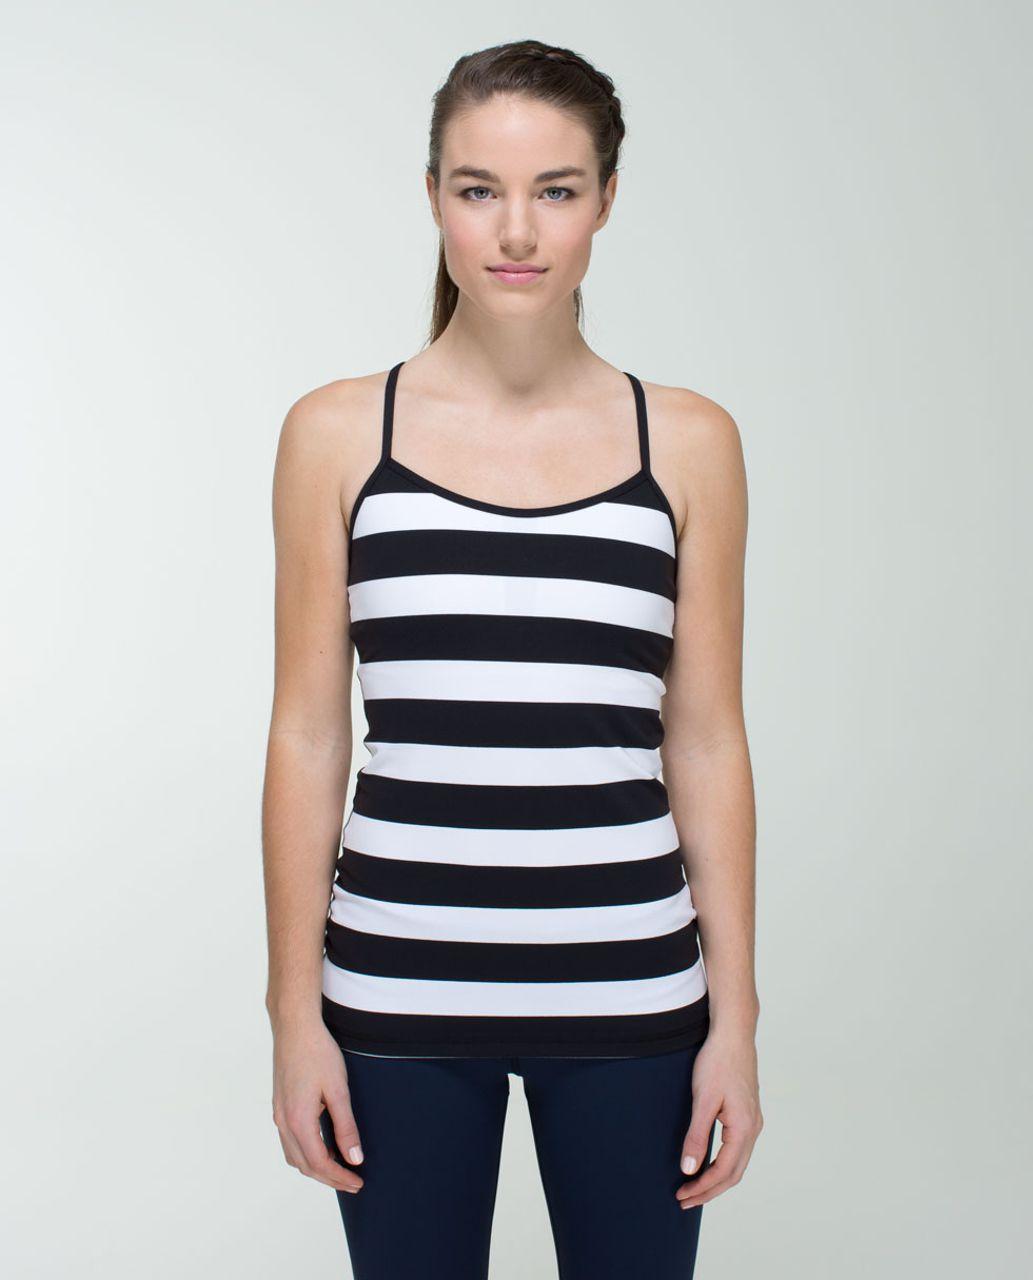 Lululemon Power Y Tank *Luon - Straightup Stripe Black White / Black